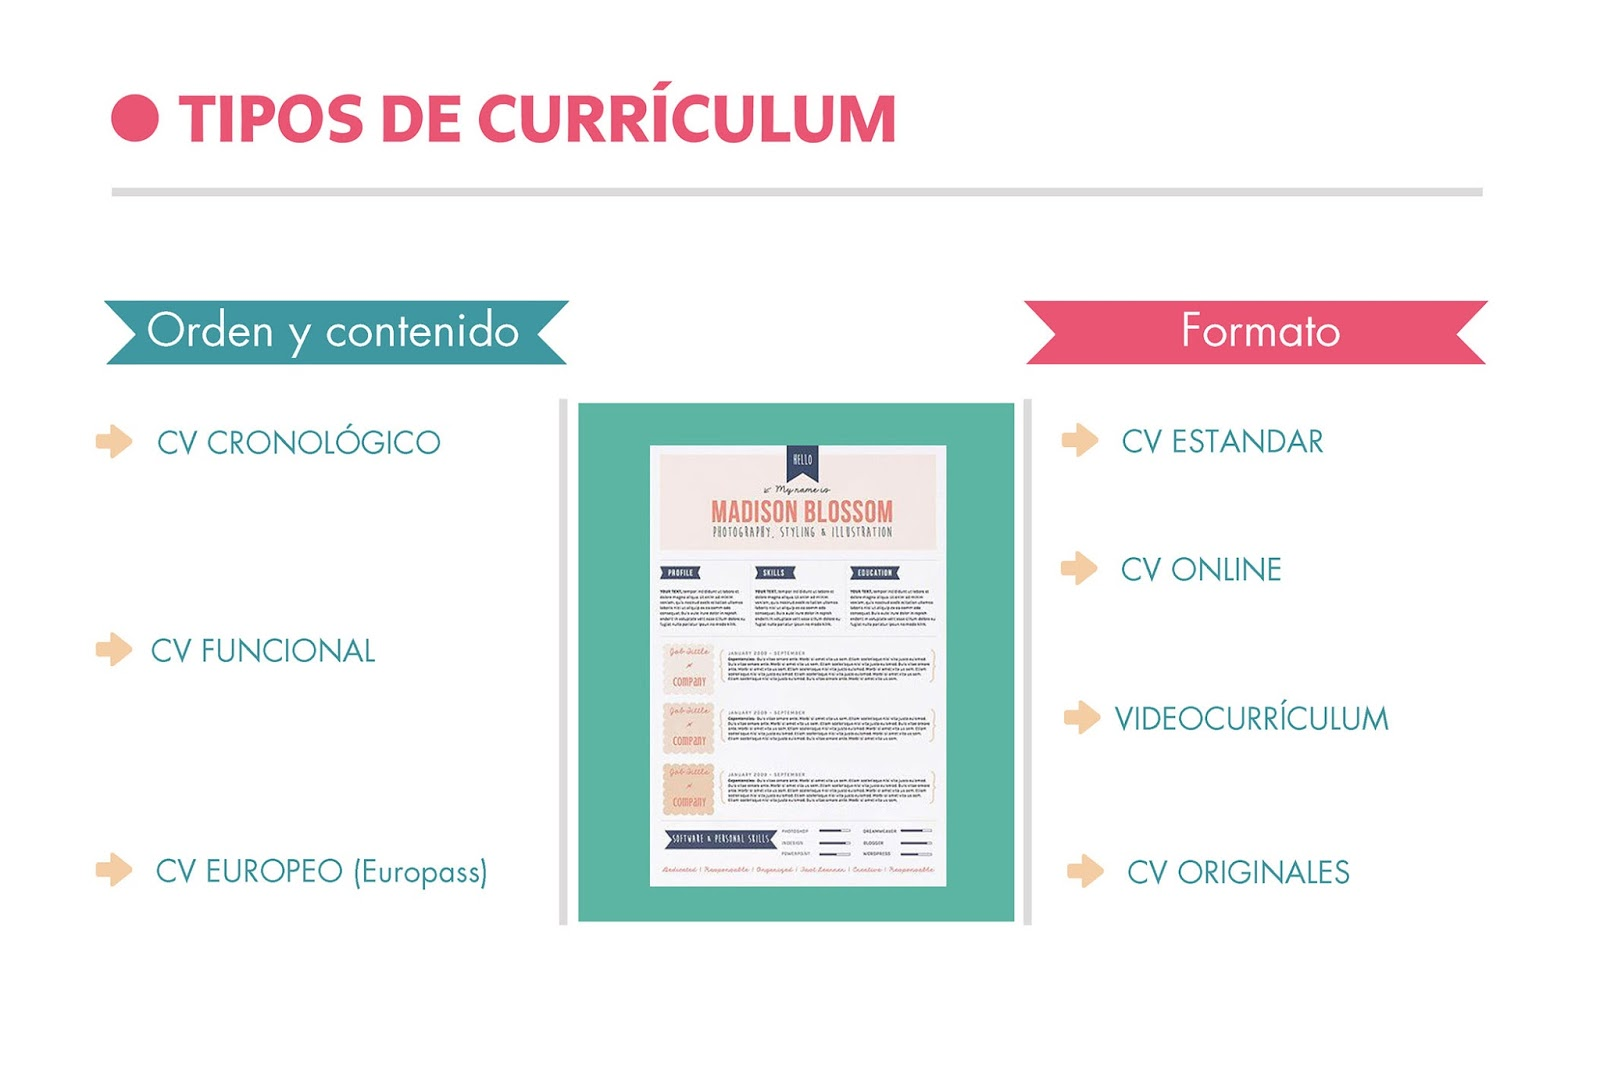 curriculum-cronologico-funcional-europeo